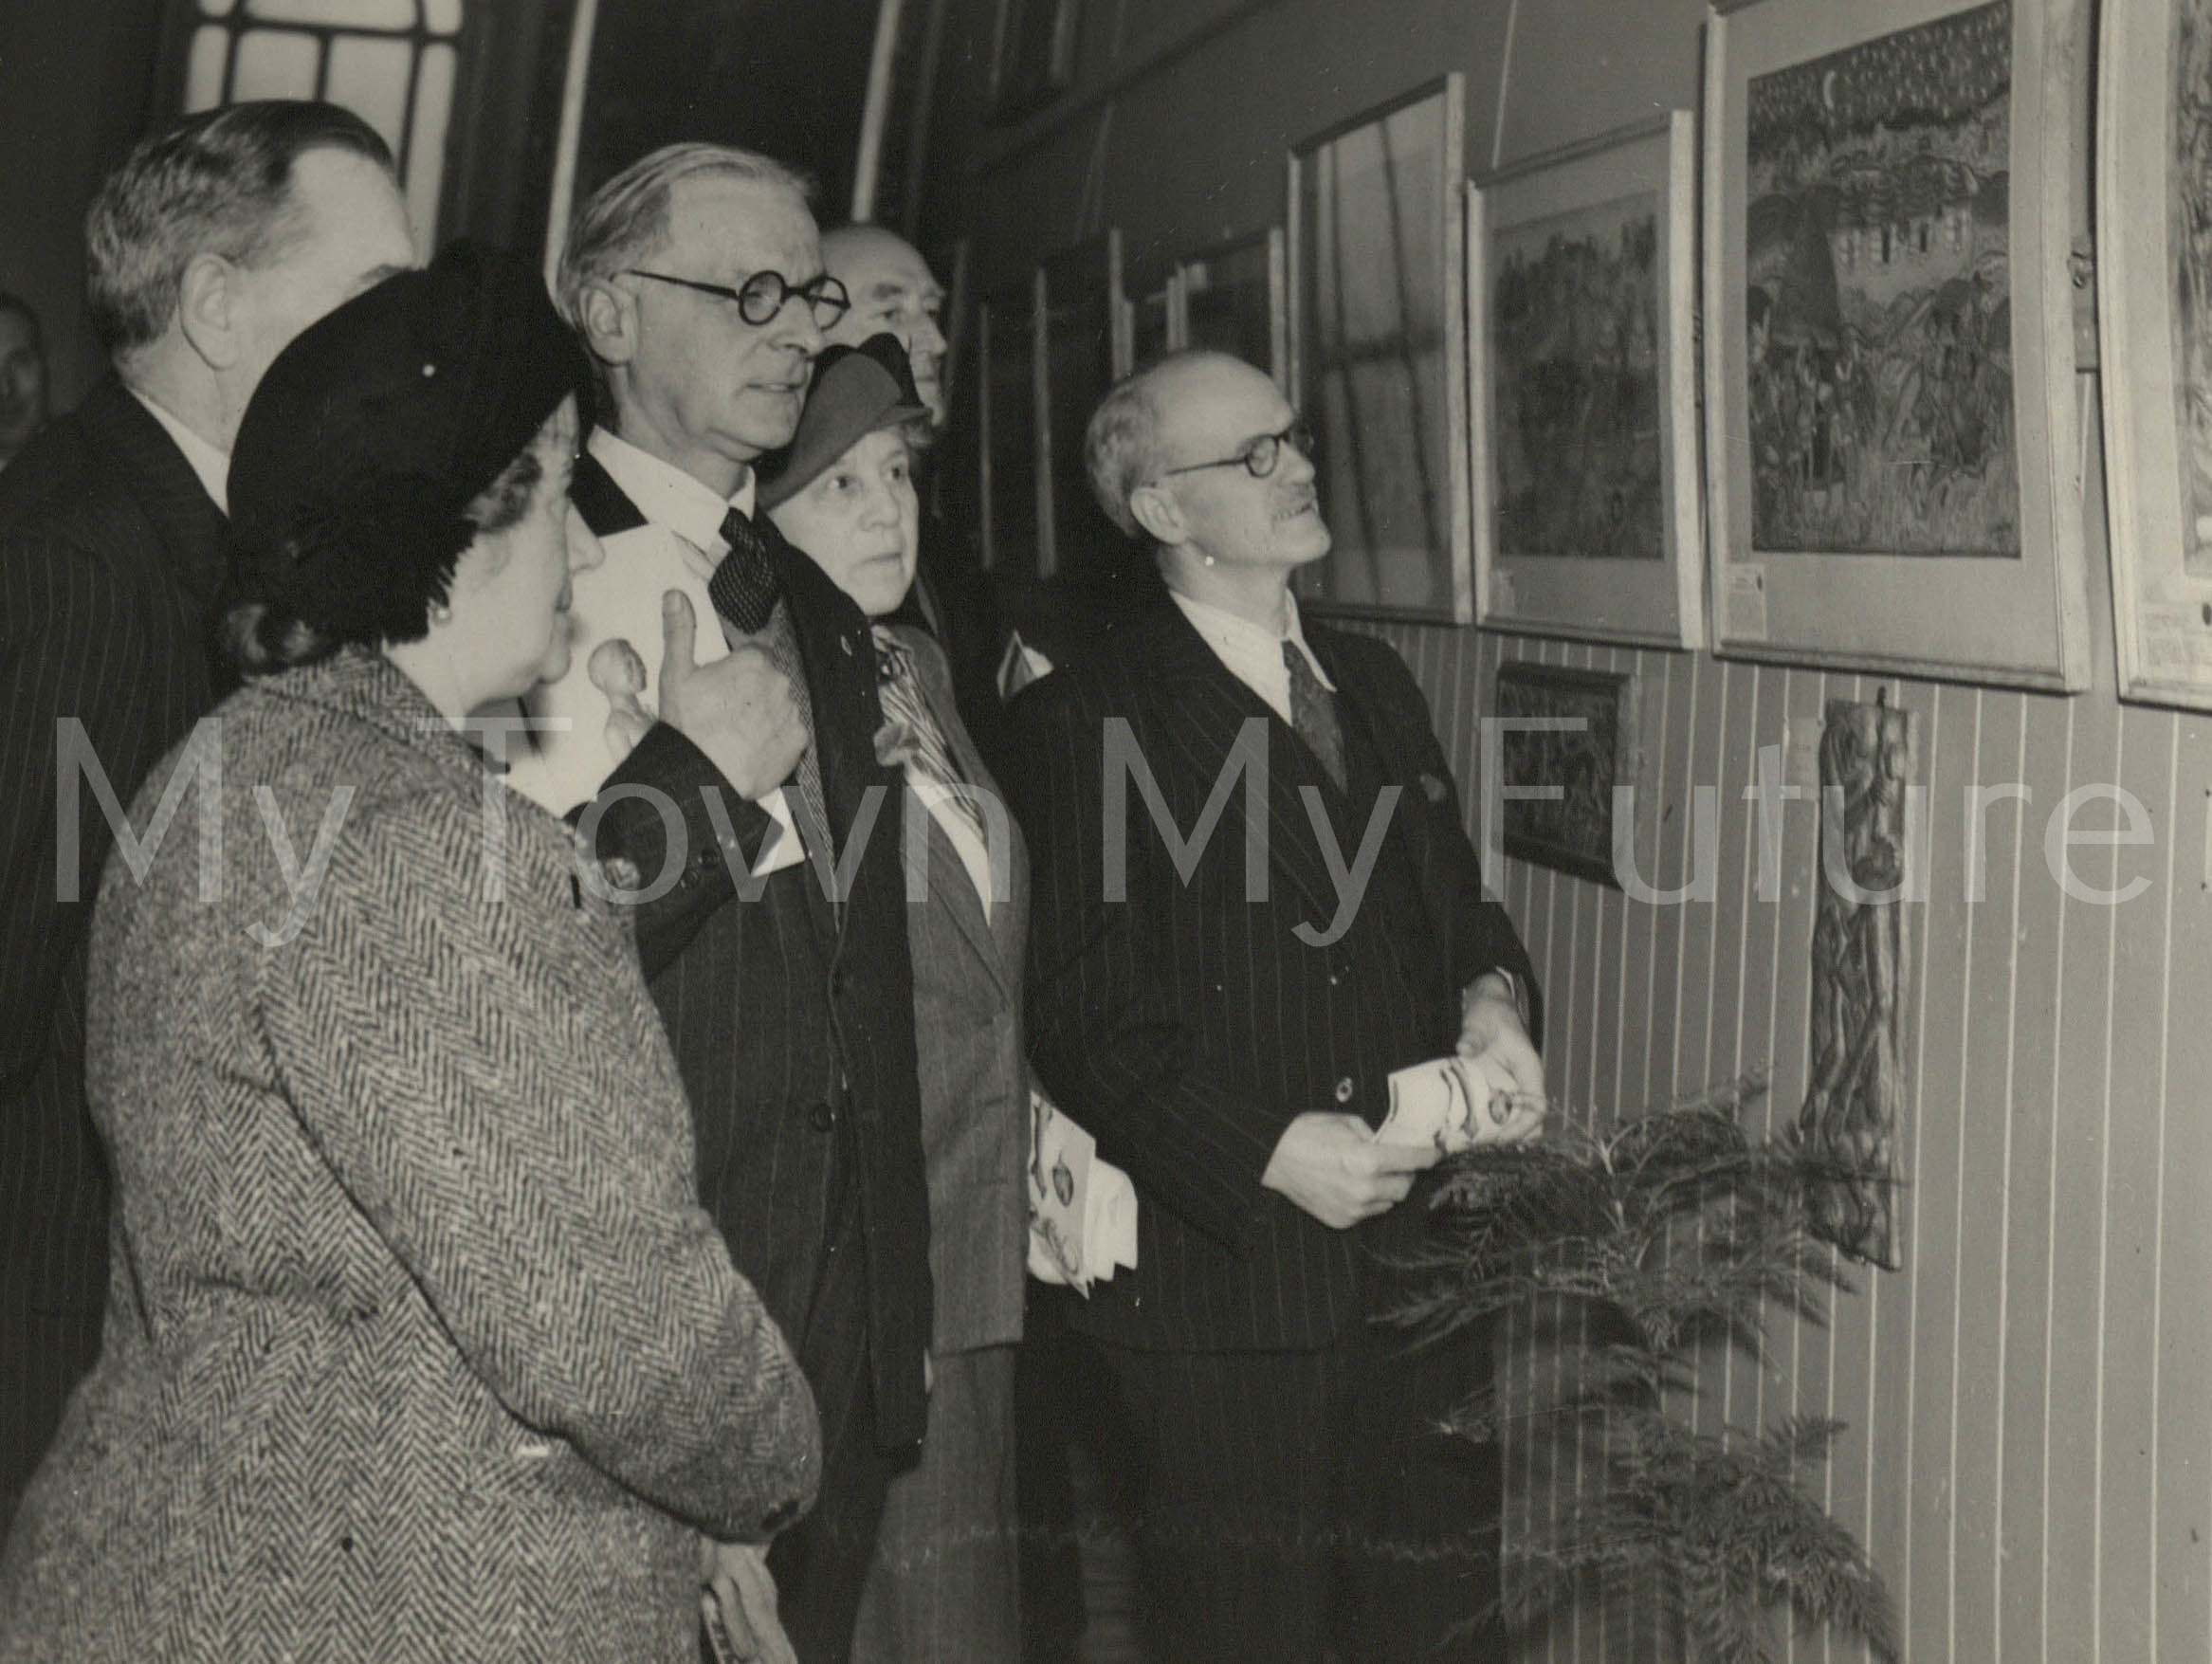 Cyrene Exhibition of Native Art